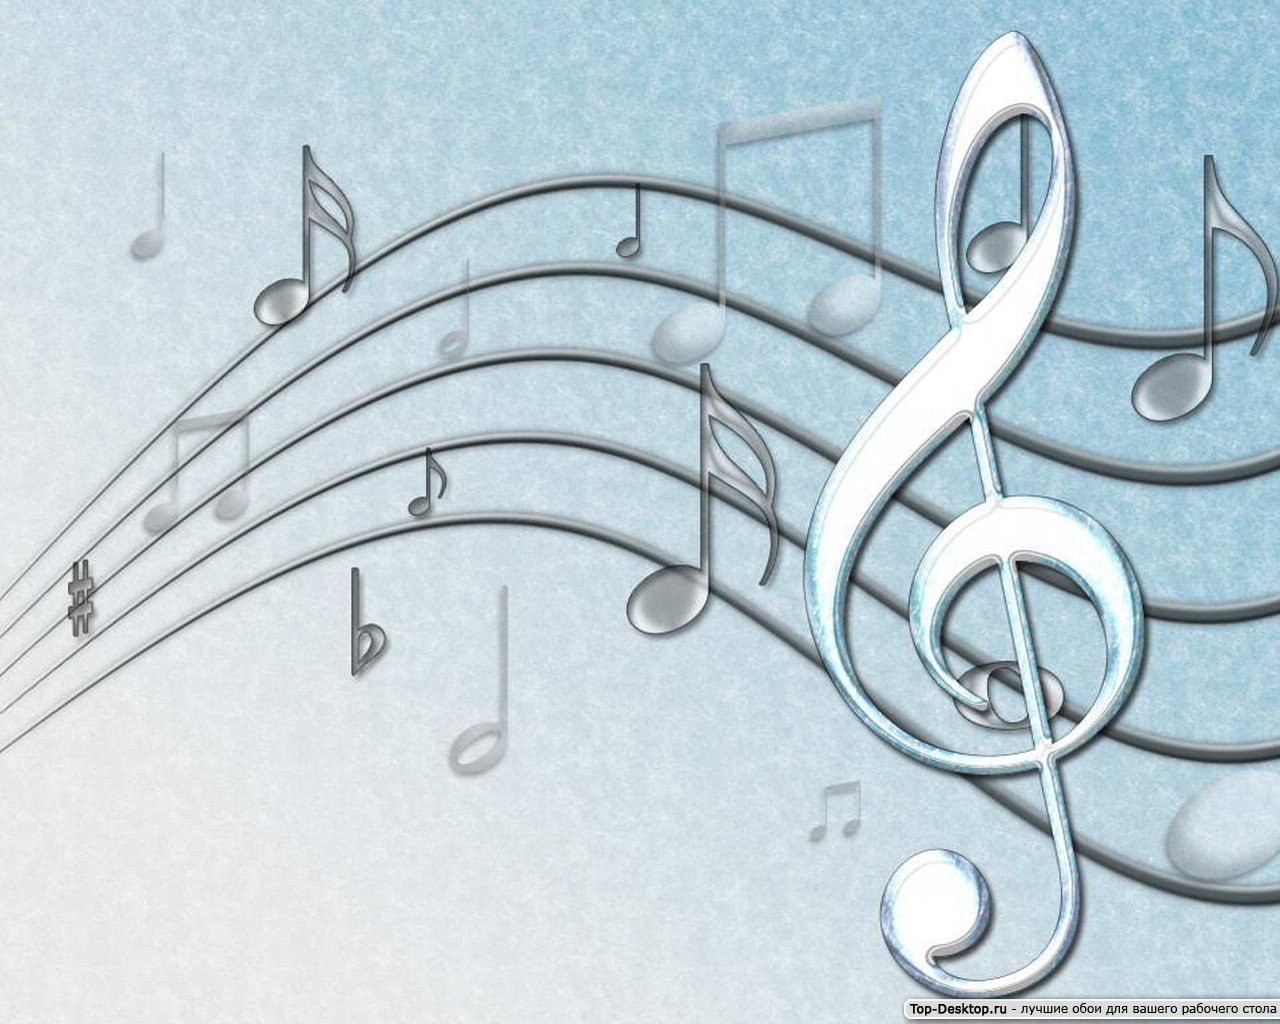 C:\Documents and Settings\UserXP\Мои документы\Мама\Музыкальные картинки\141.jpg